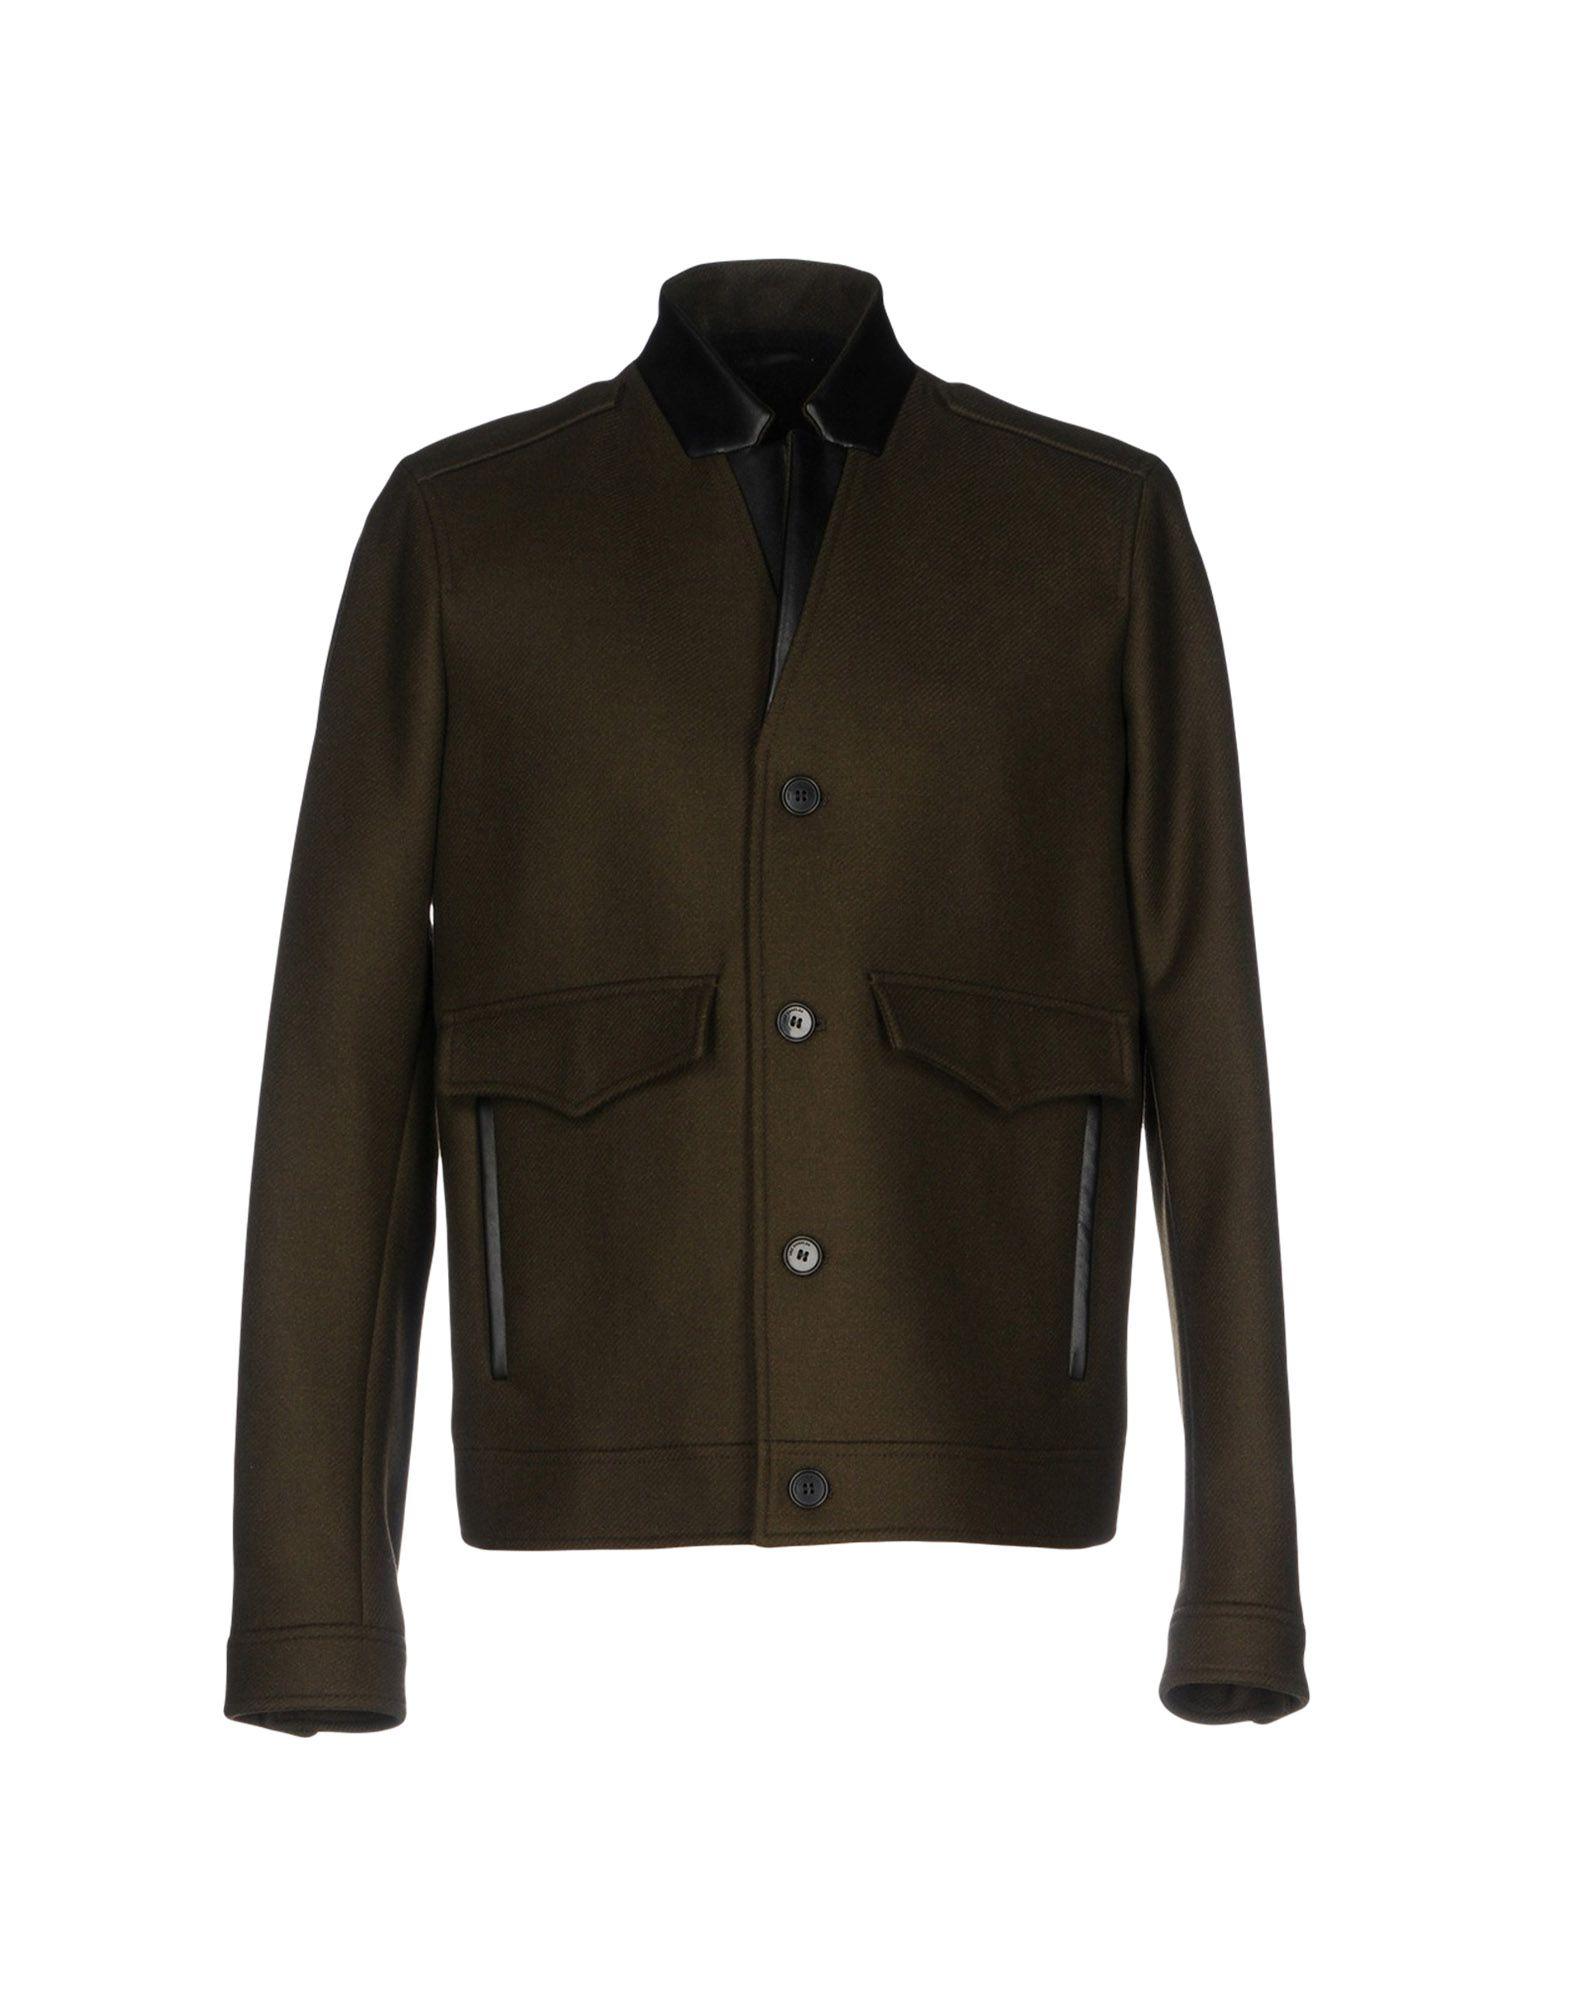 THE KOOPLES Пальто пальто зима кожаные рукава цена